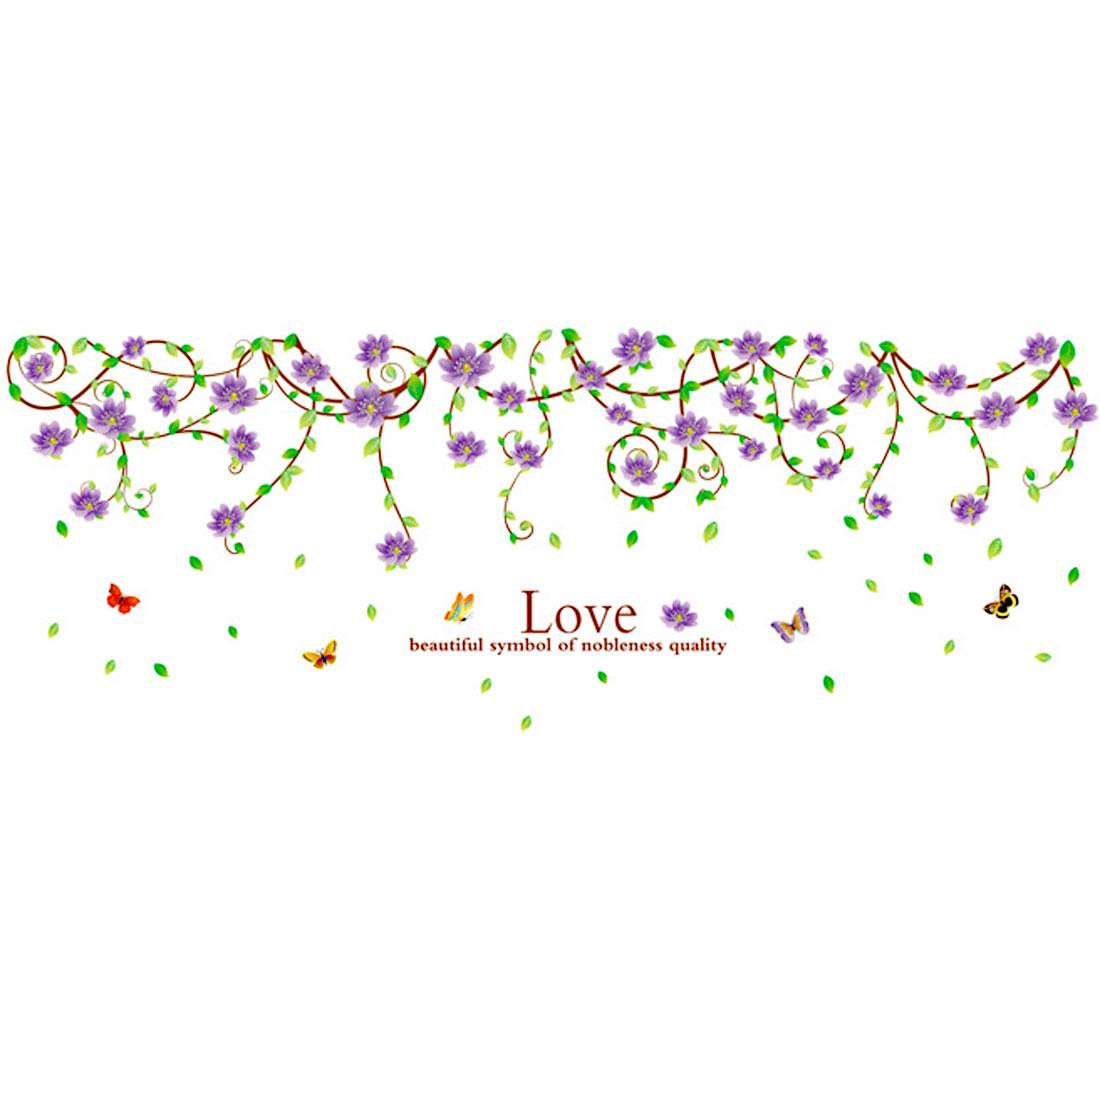 Family Decor Floral Butterfly Print Cabinet Wall Sticker Purple Green 90 x 60cm - image 4 de 4